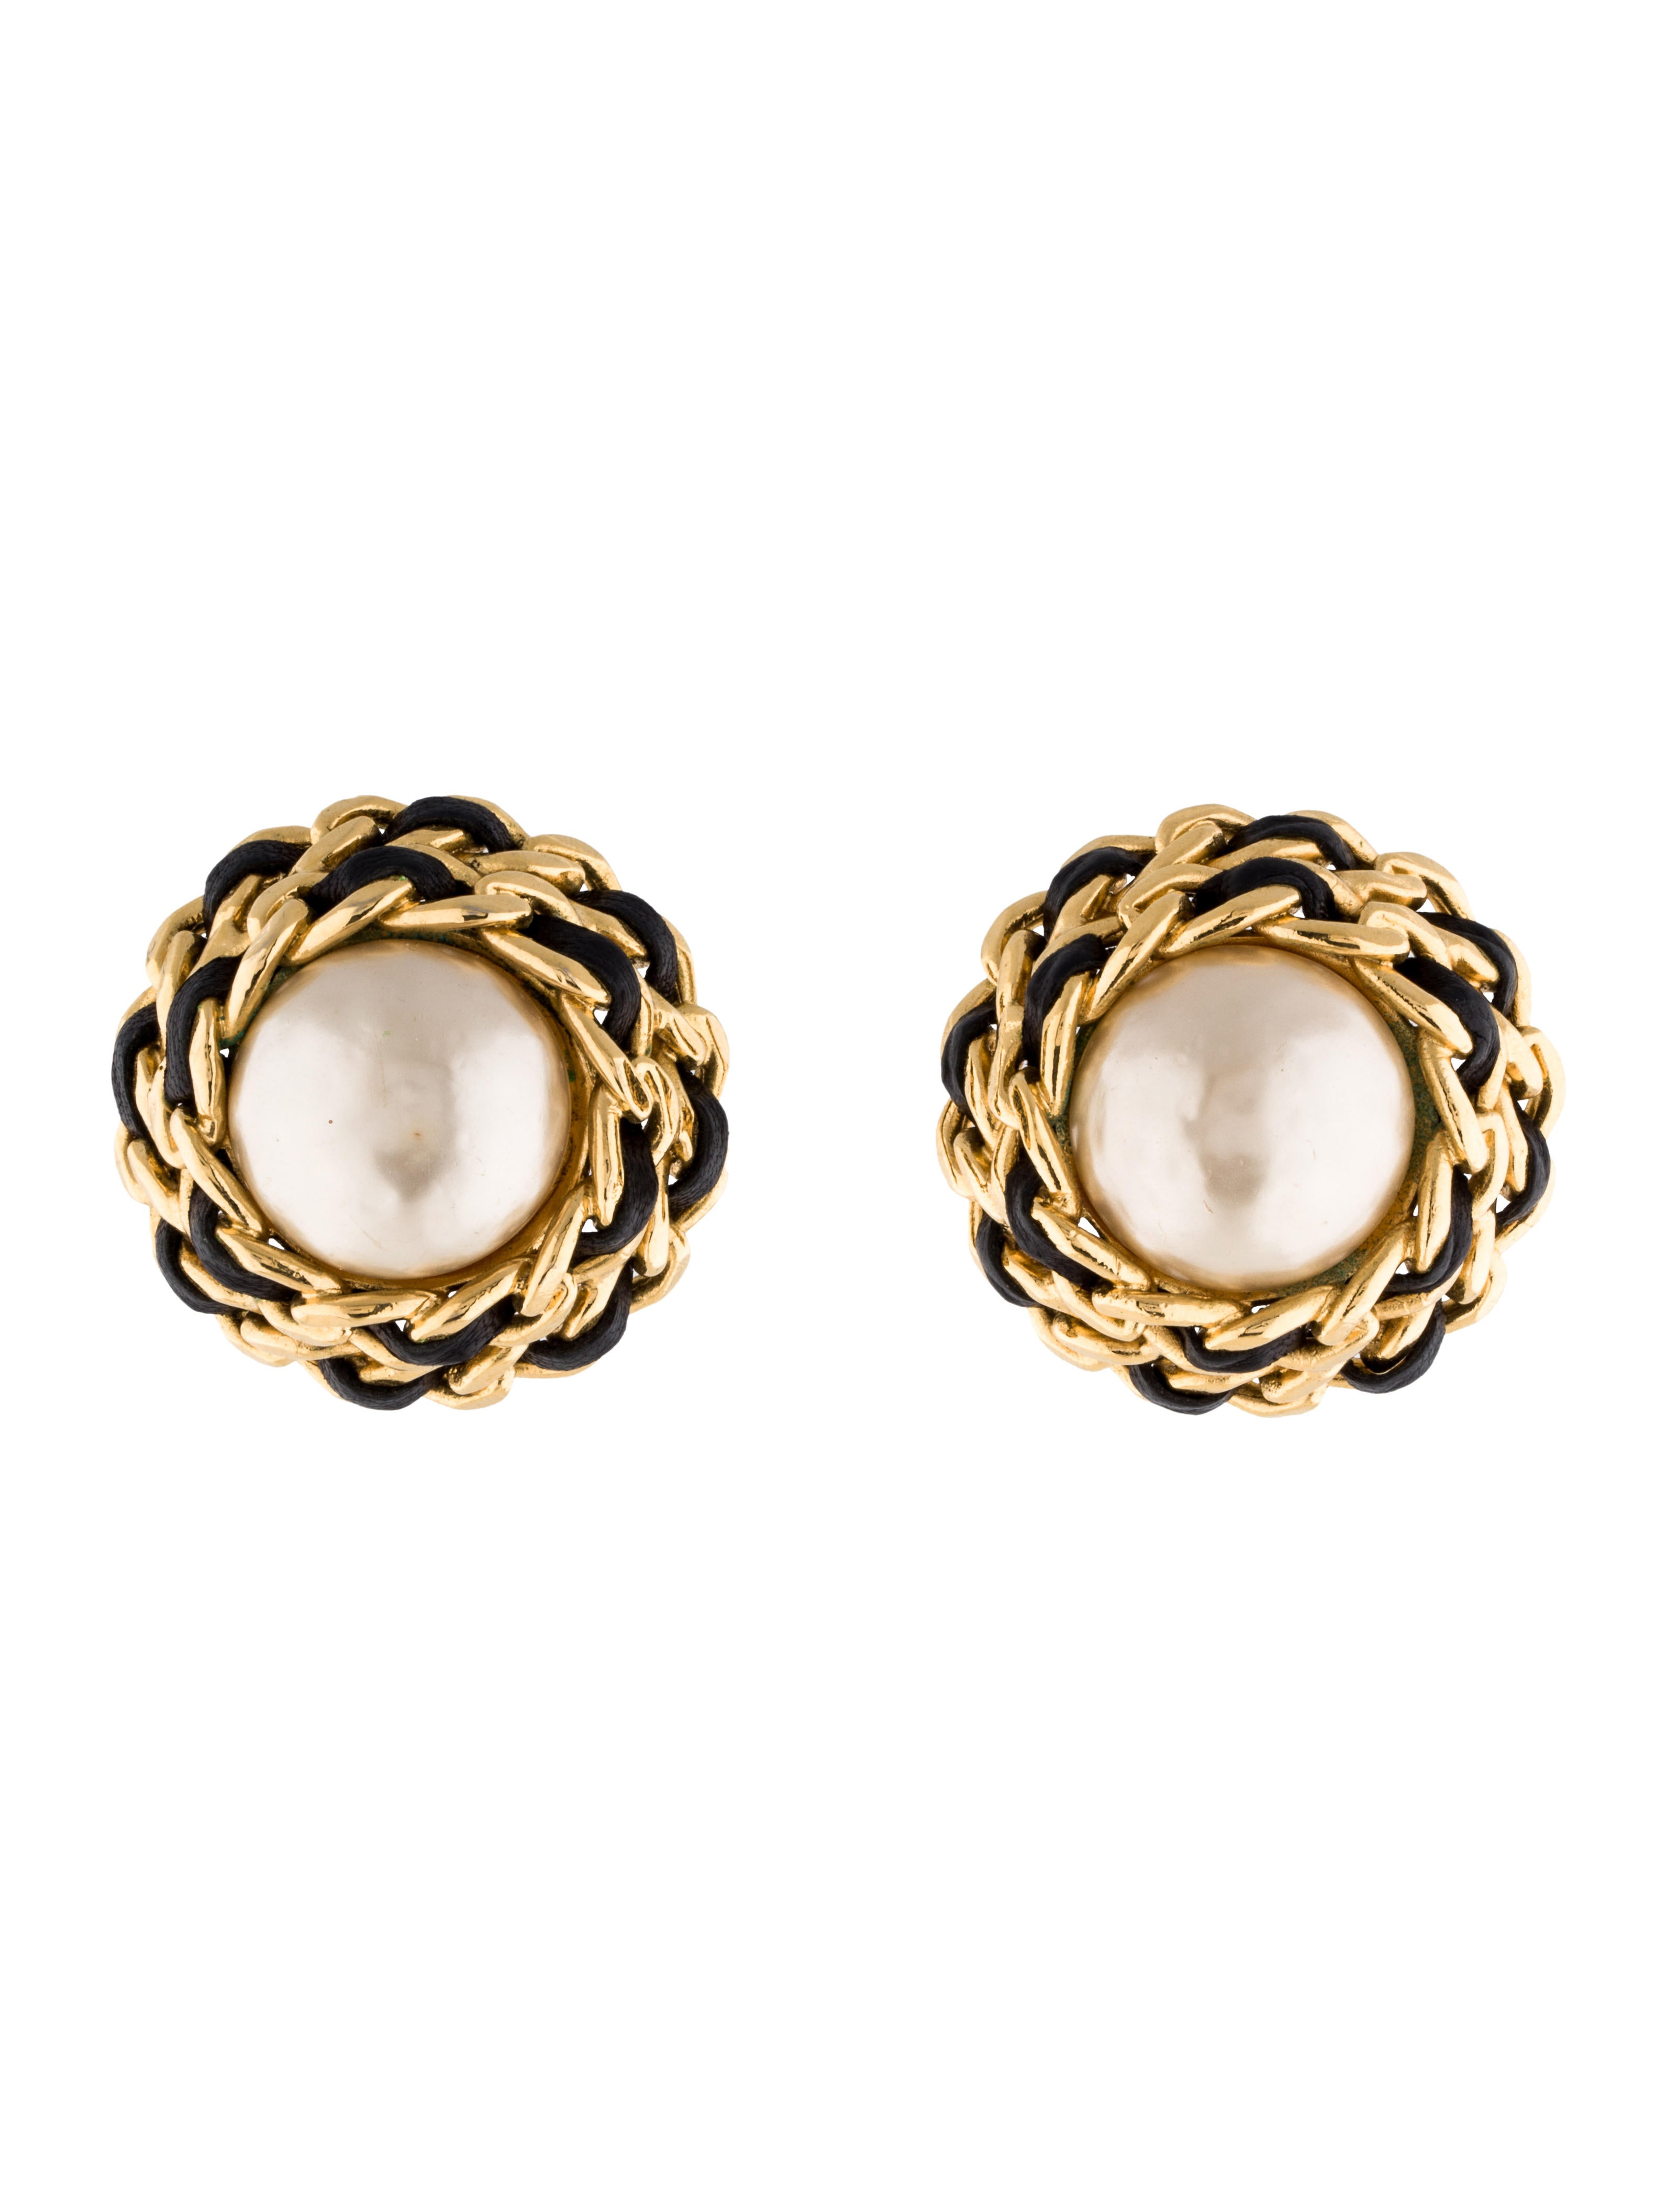 chanel faux pearl stud earrings earrings cha98642. Black Bedroom Furniture Sets. Home Design Ideas